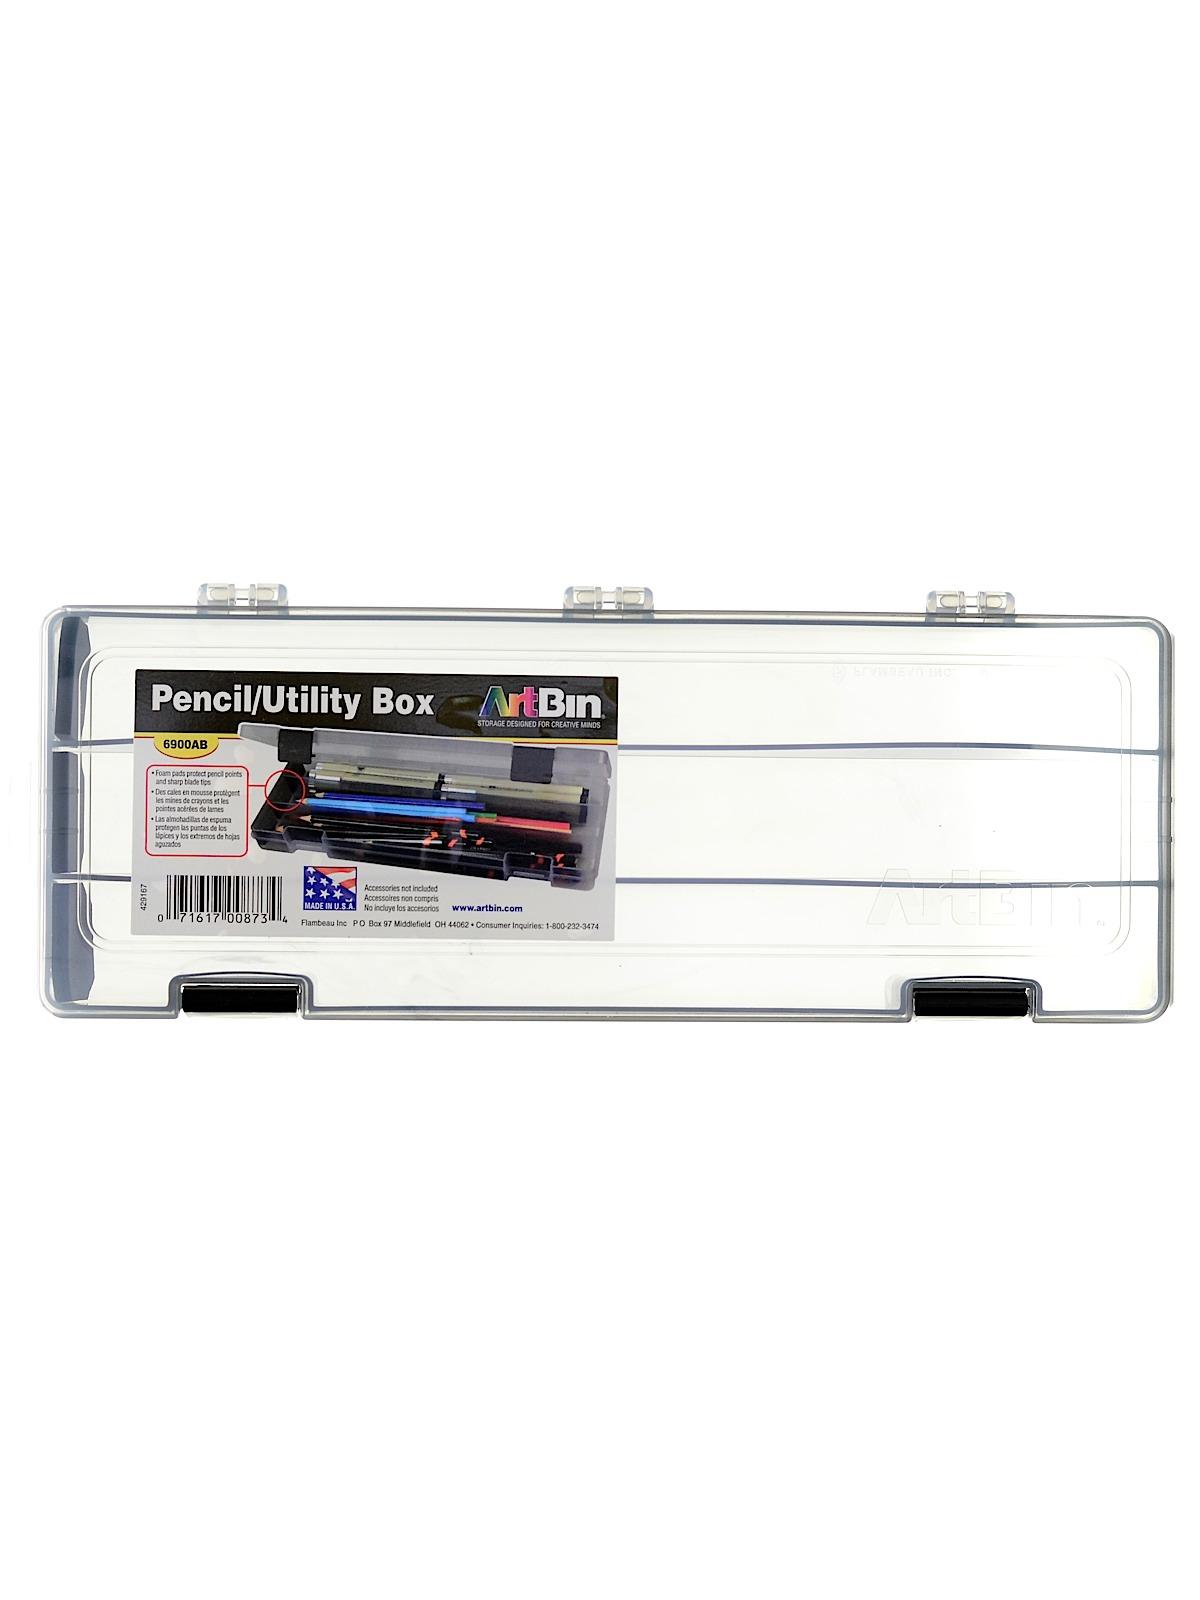 Pencil/Utility Box